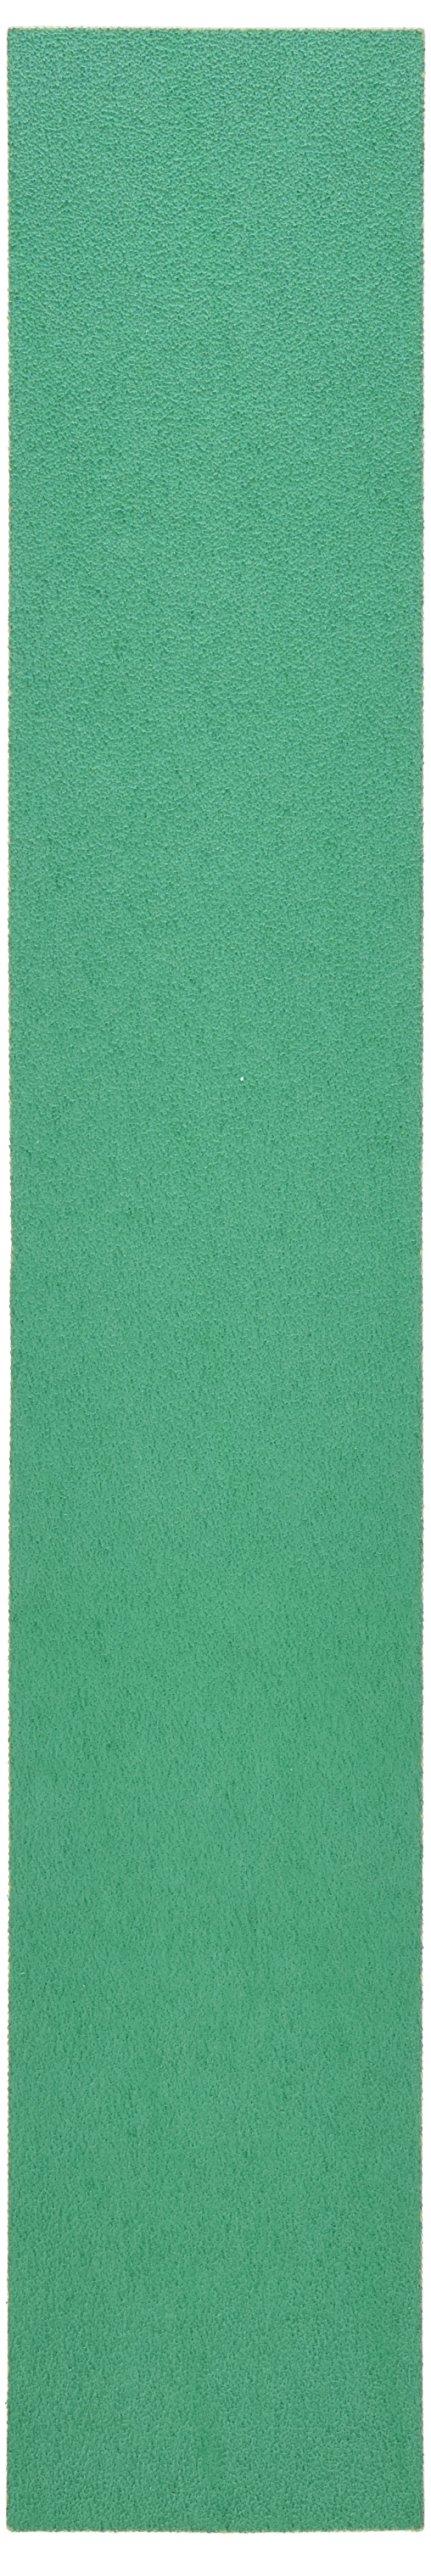 3M 02230 Green Corps Stikit 2-3/4'' x 16-1/2'' 80D Grit Production Sheet